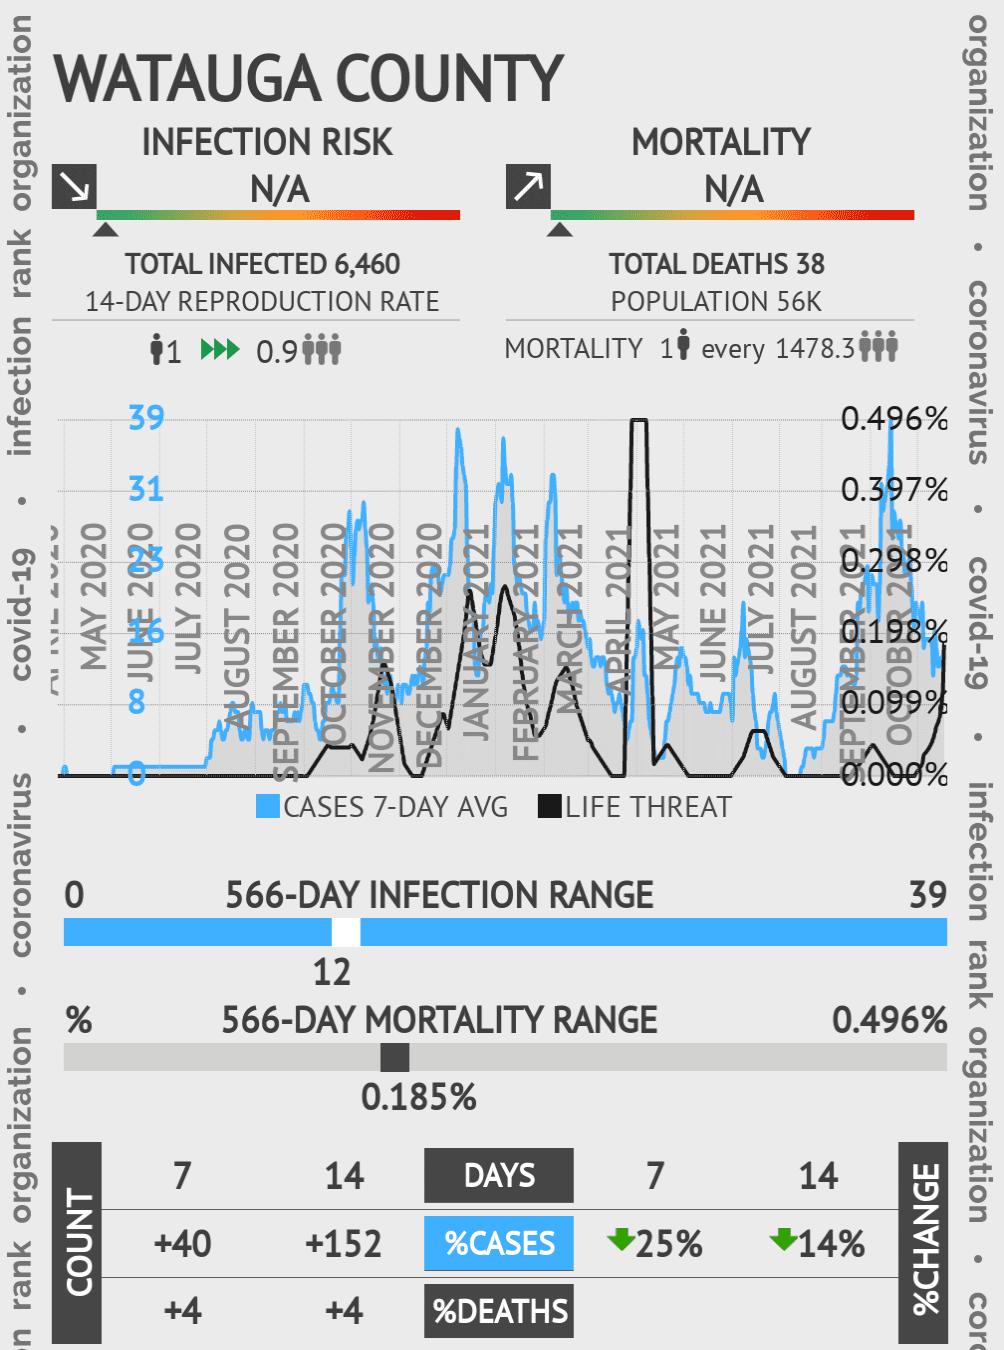 Watauga County Coronavirus Covid-19 Risk of Infection on July 24, 2021